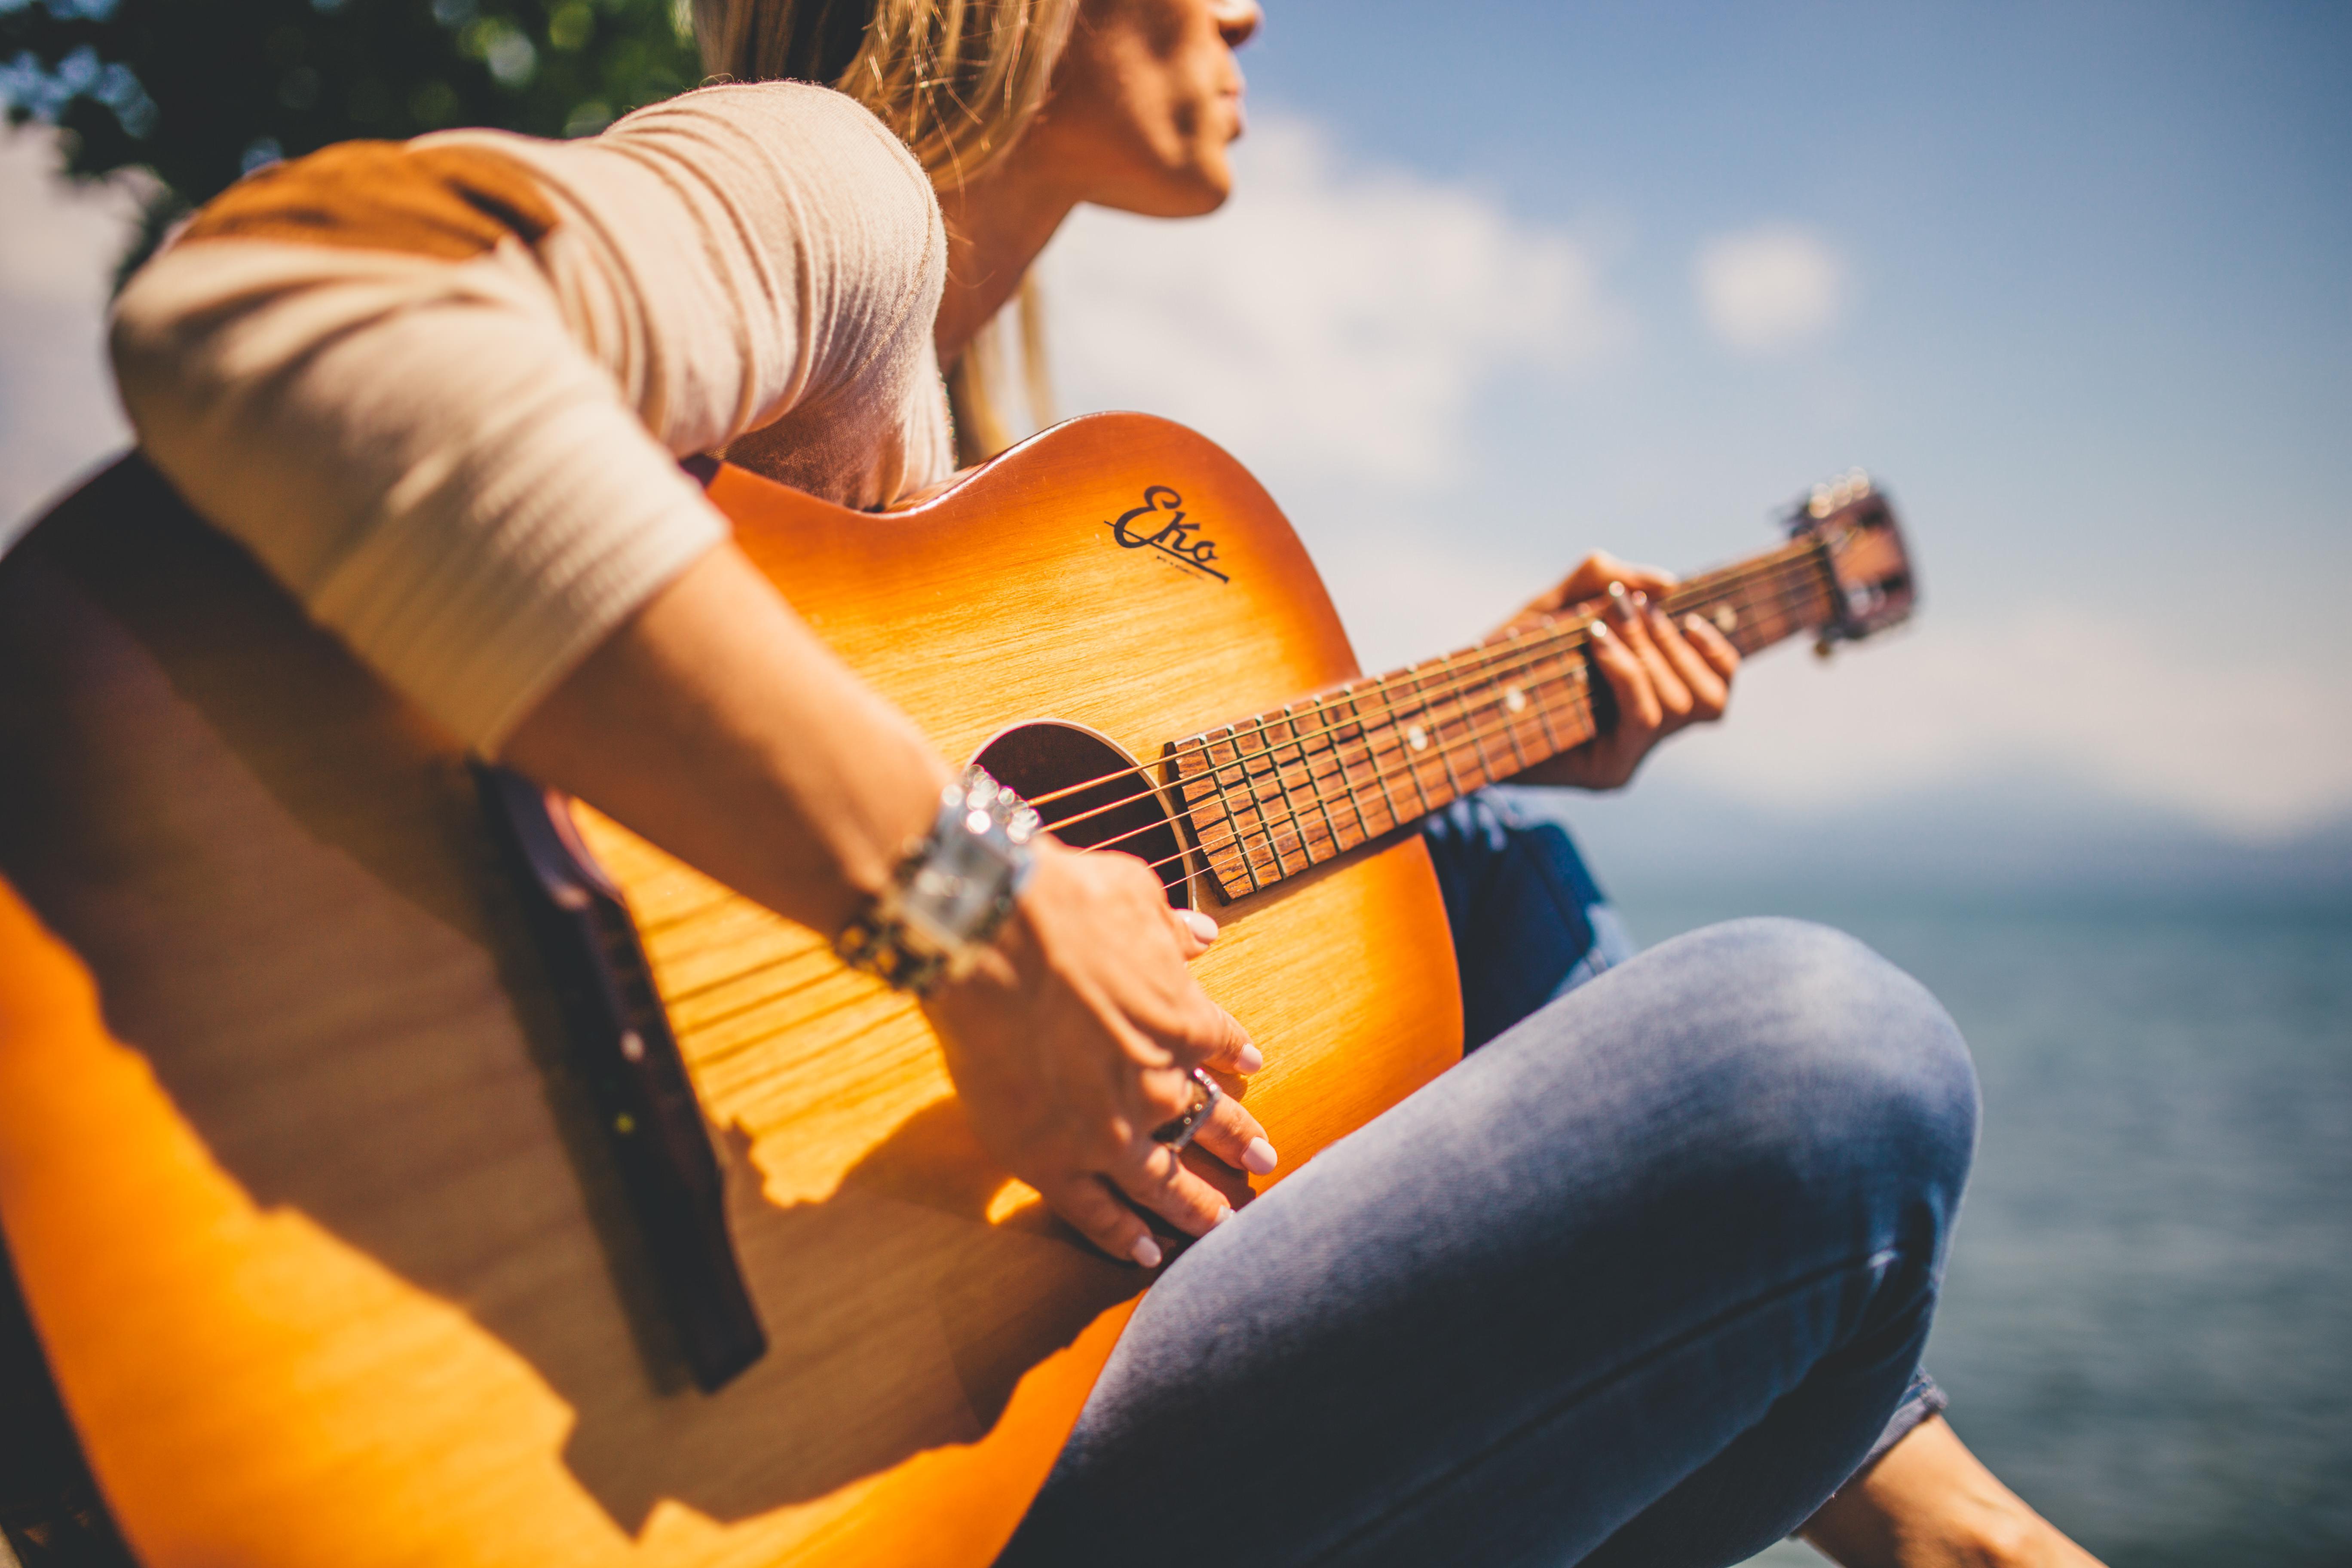 Guitarist, Activity, Guitar, Music, Outdoors, HQ Photo